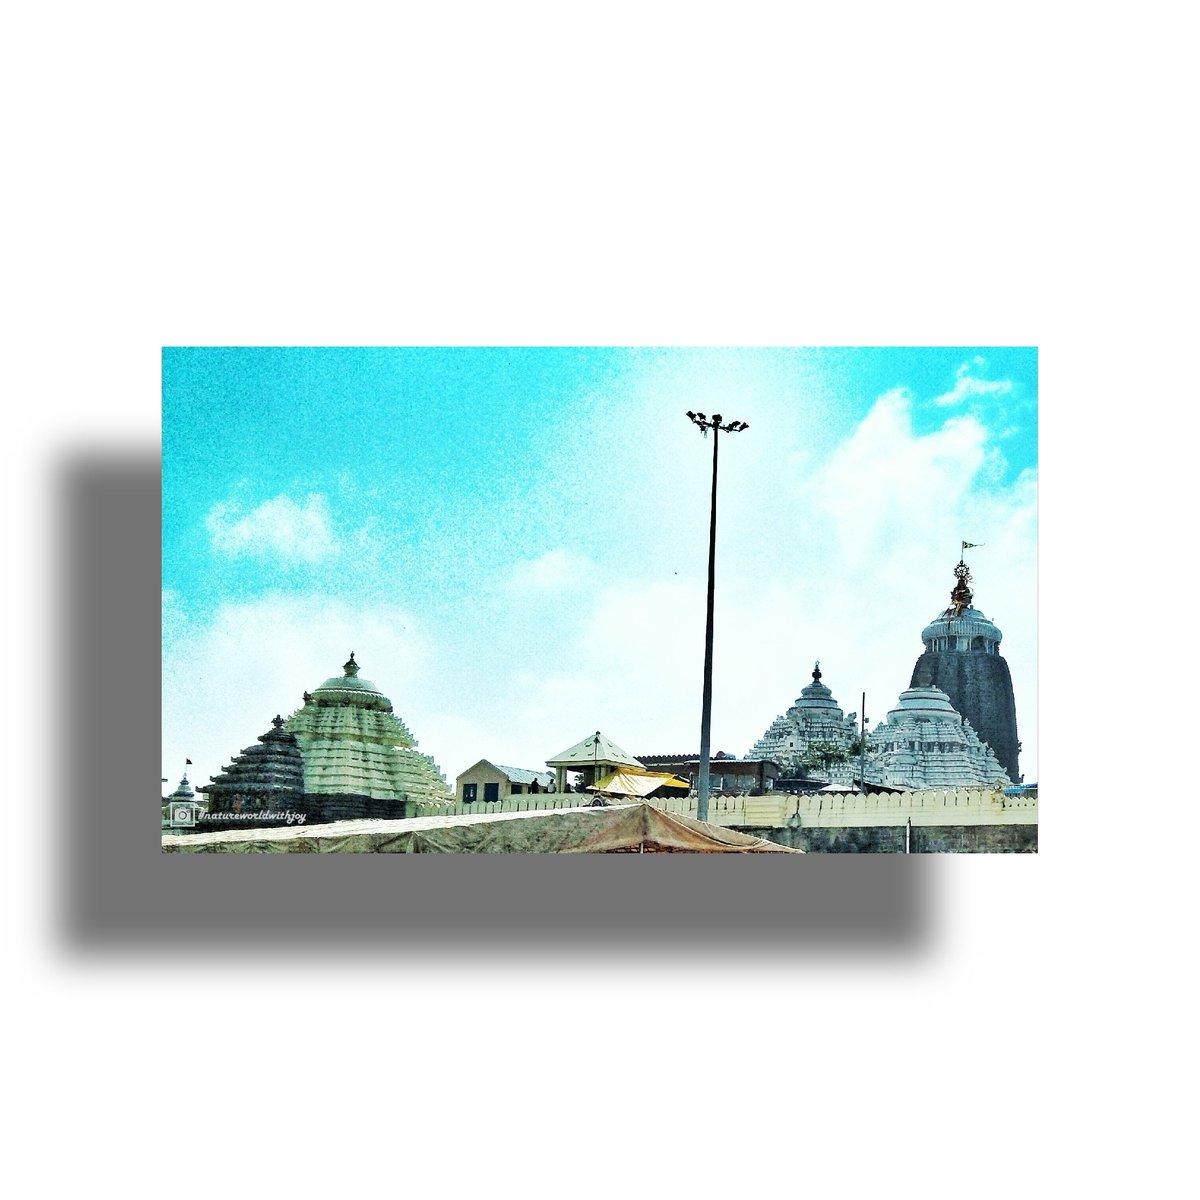 Jay Jagarnath.🙏Jagarnath temple Puri.❤ #natureworldwithjoy #storisofodisha #purijagannadh #jagannathtemple #puri #rathyatra #jaijagannath #jagannath #lordjagannath #harekrishna #odisha #india #temple #krishna #jagannathpuri  #jagannathswami #justkalinga #tantric #sanatana https://t.co/TwwakHaCZv